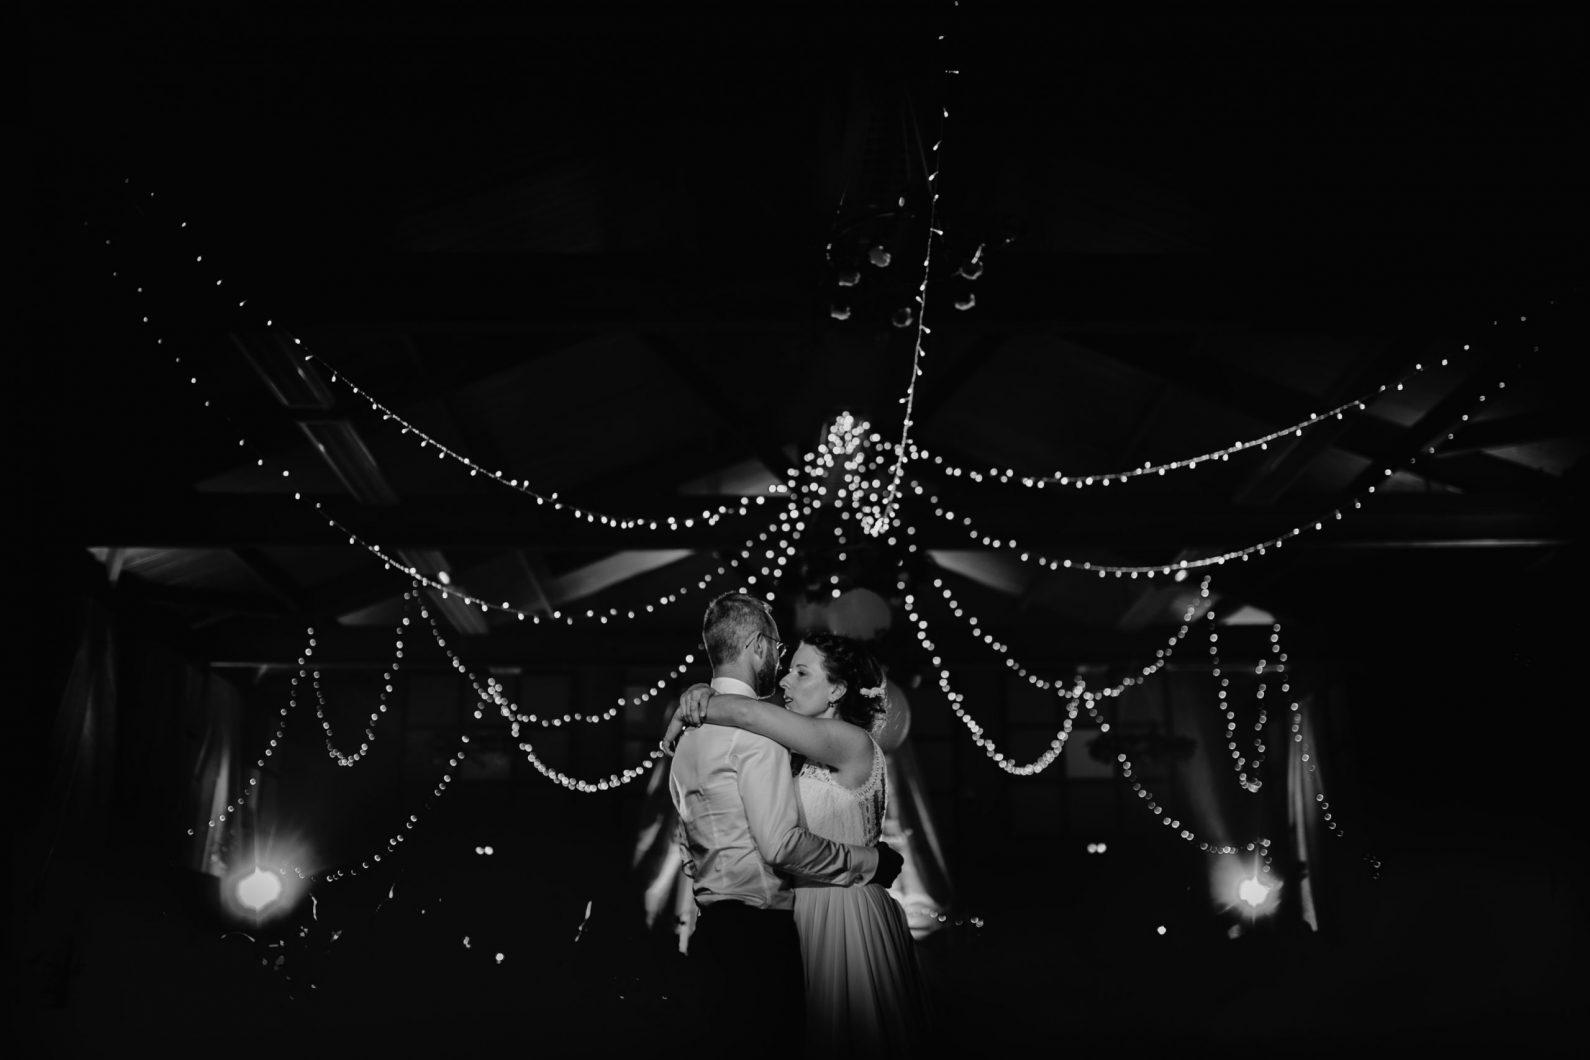 Bal-mariage-photographe-nantes-rennes-angers